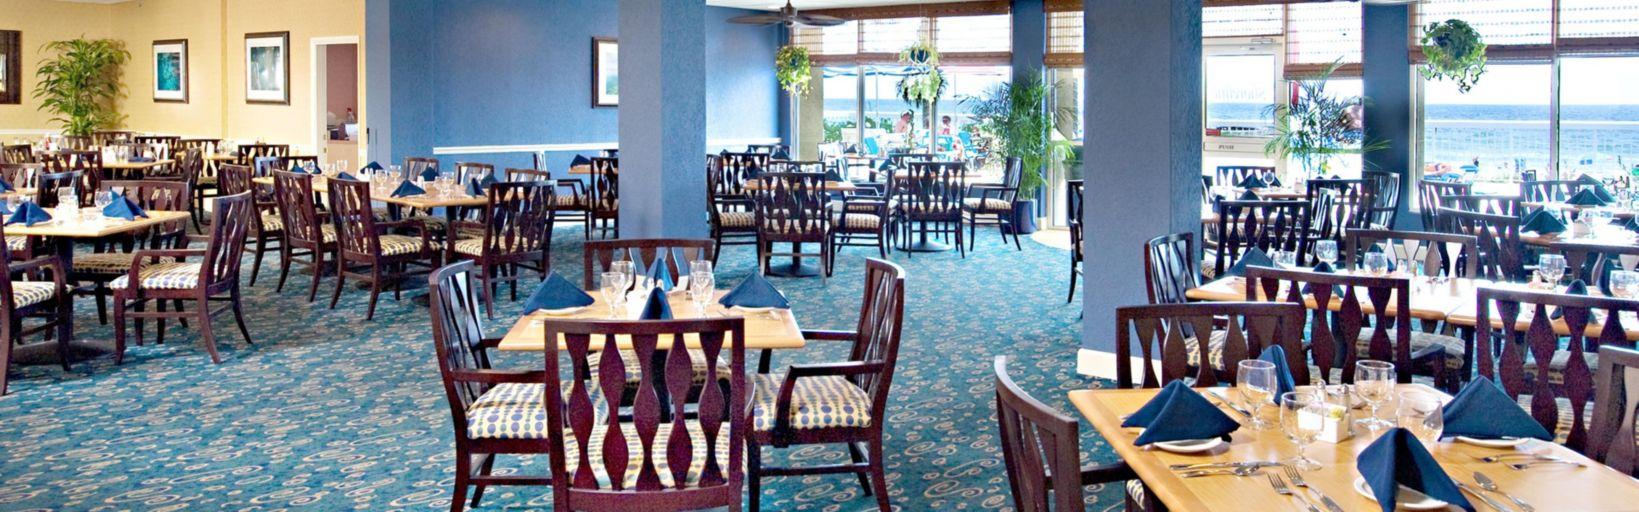 Restaurants Near Holiday Inn Oceanfront @ Surfside Beach